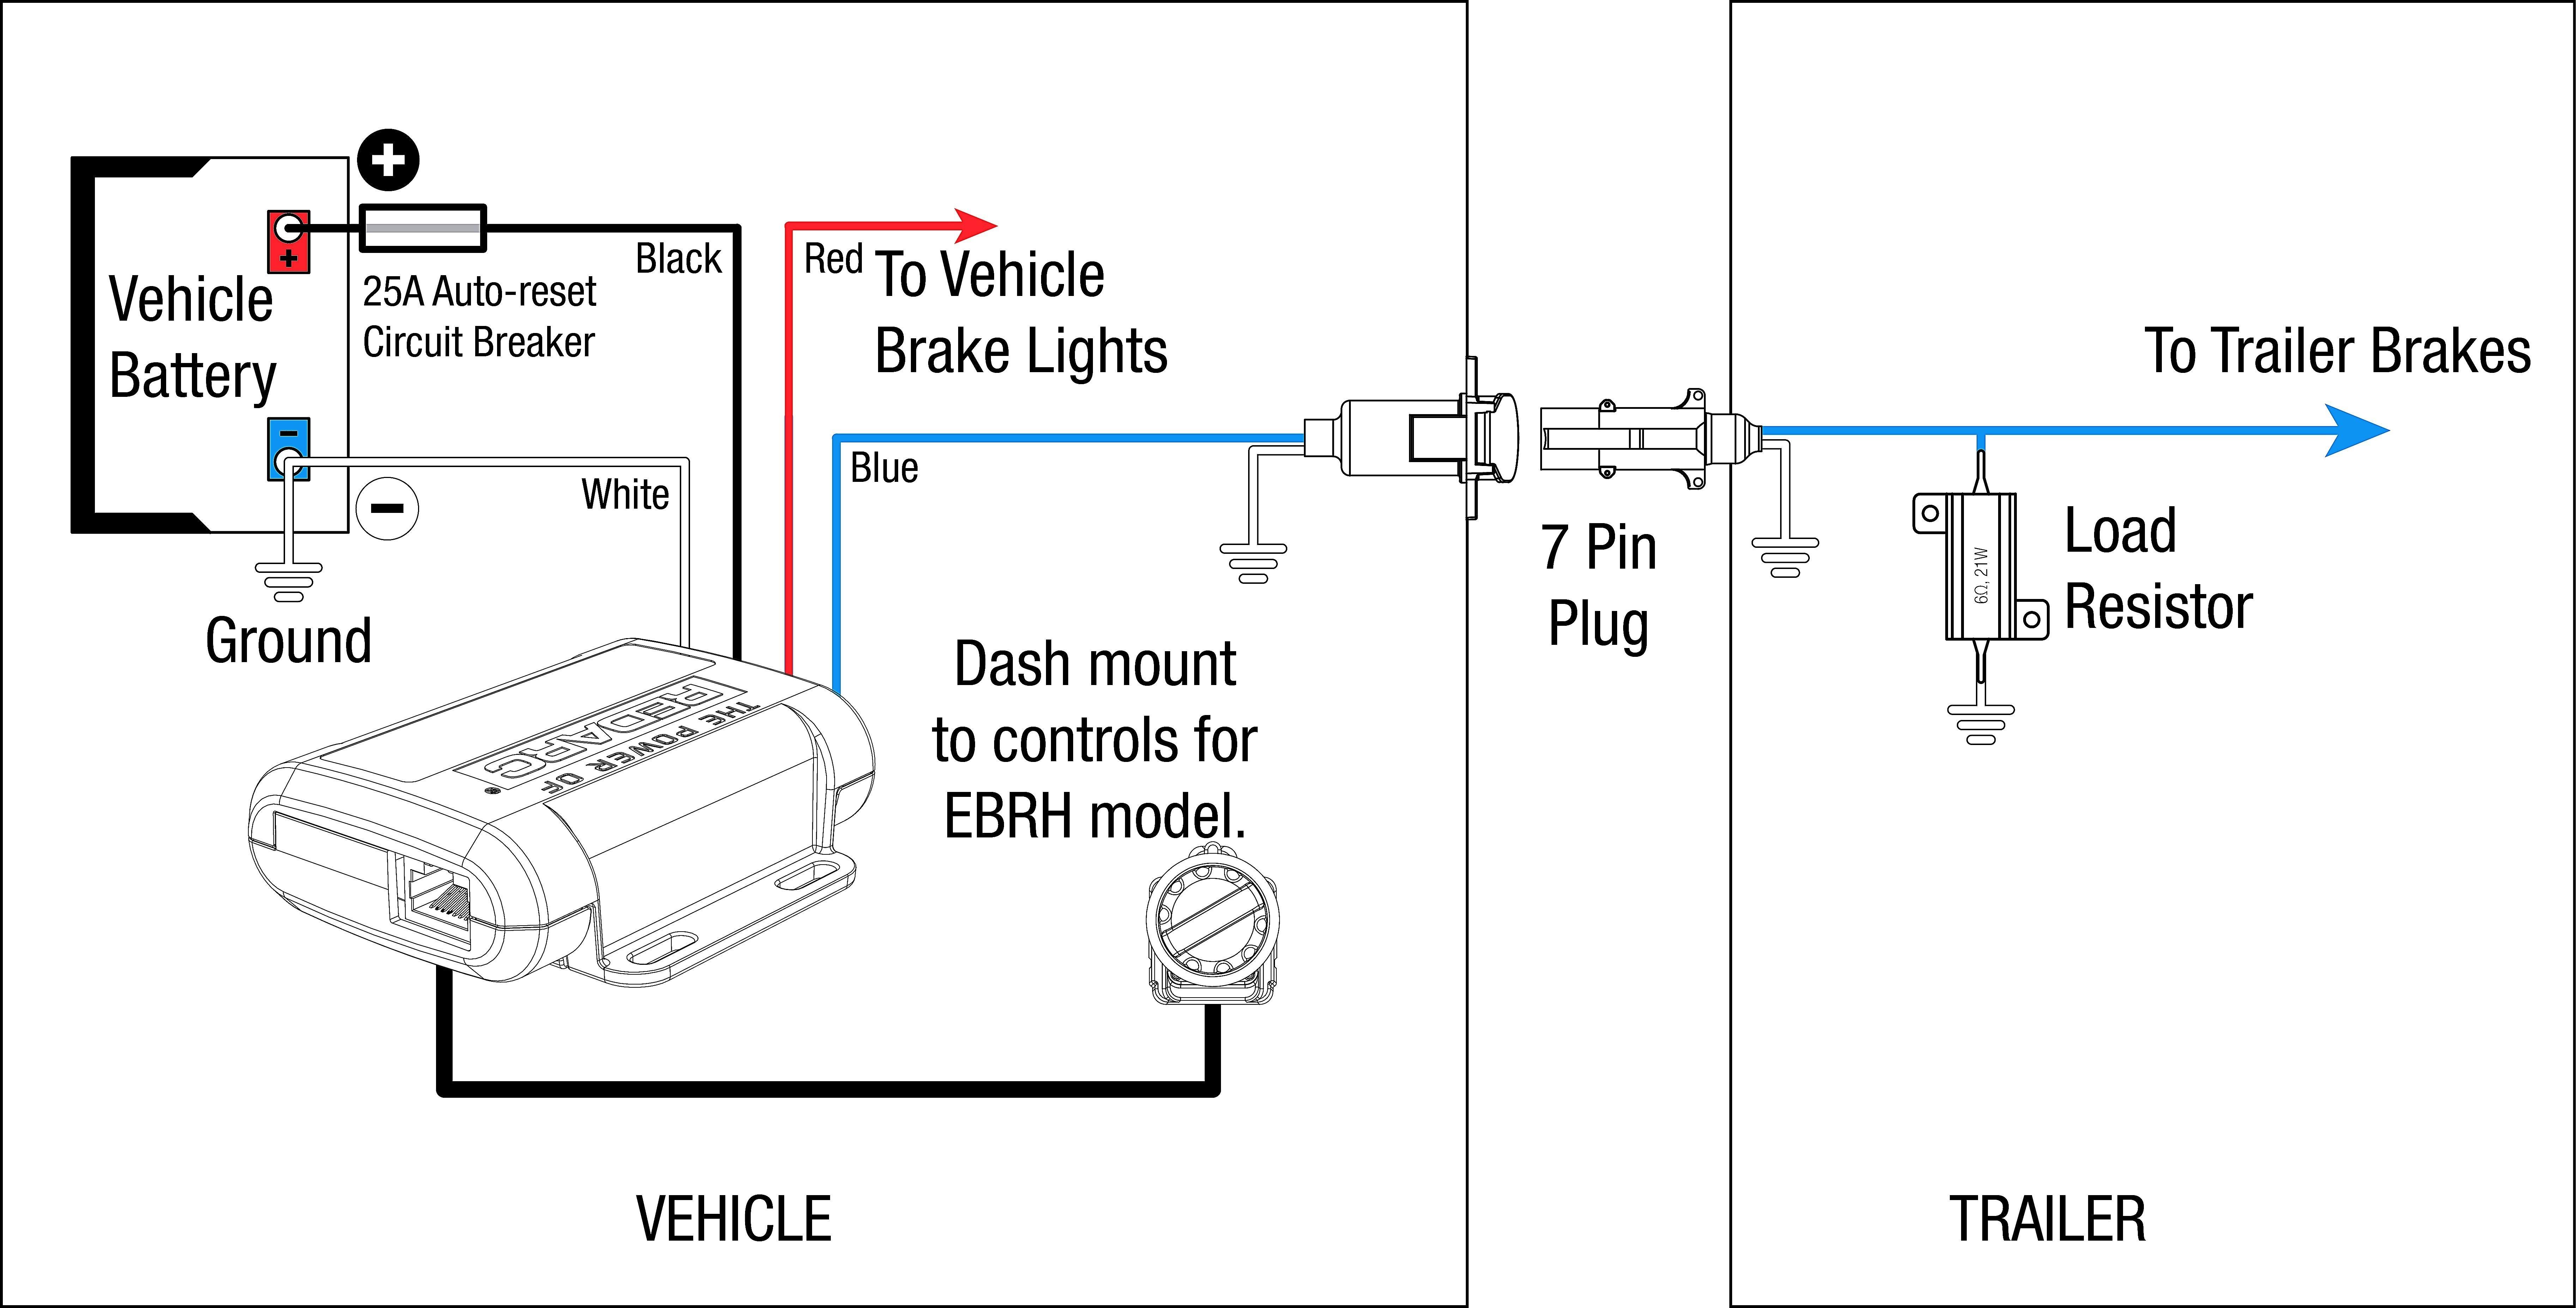 Breakaway Switch Wiring Diagram Wiring Diagram Trailer Breakaway Switch Inspirationa Break Away Fine Of Breakaway Switch Wiring Diagram